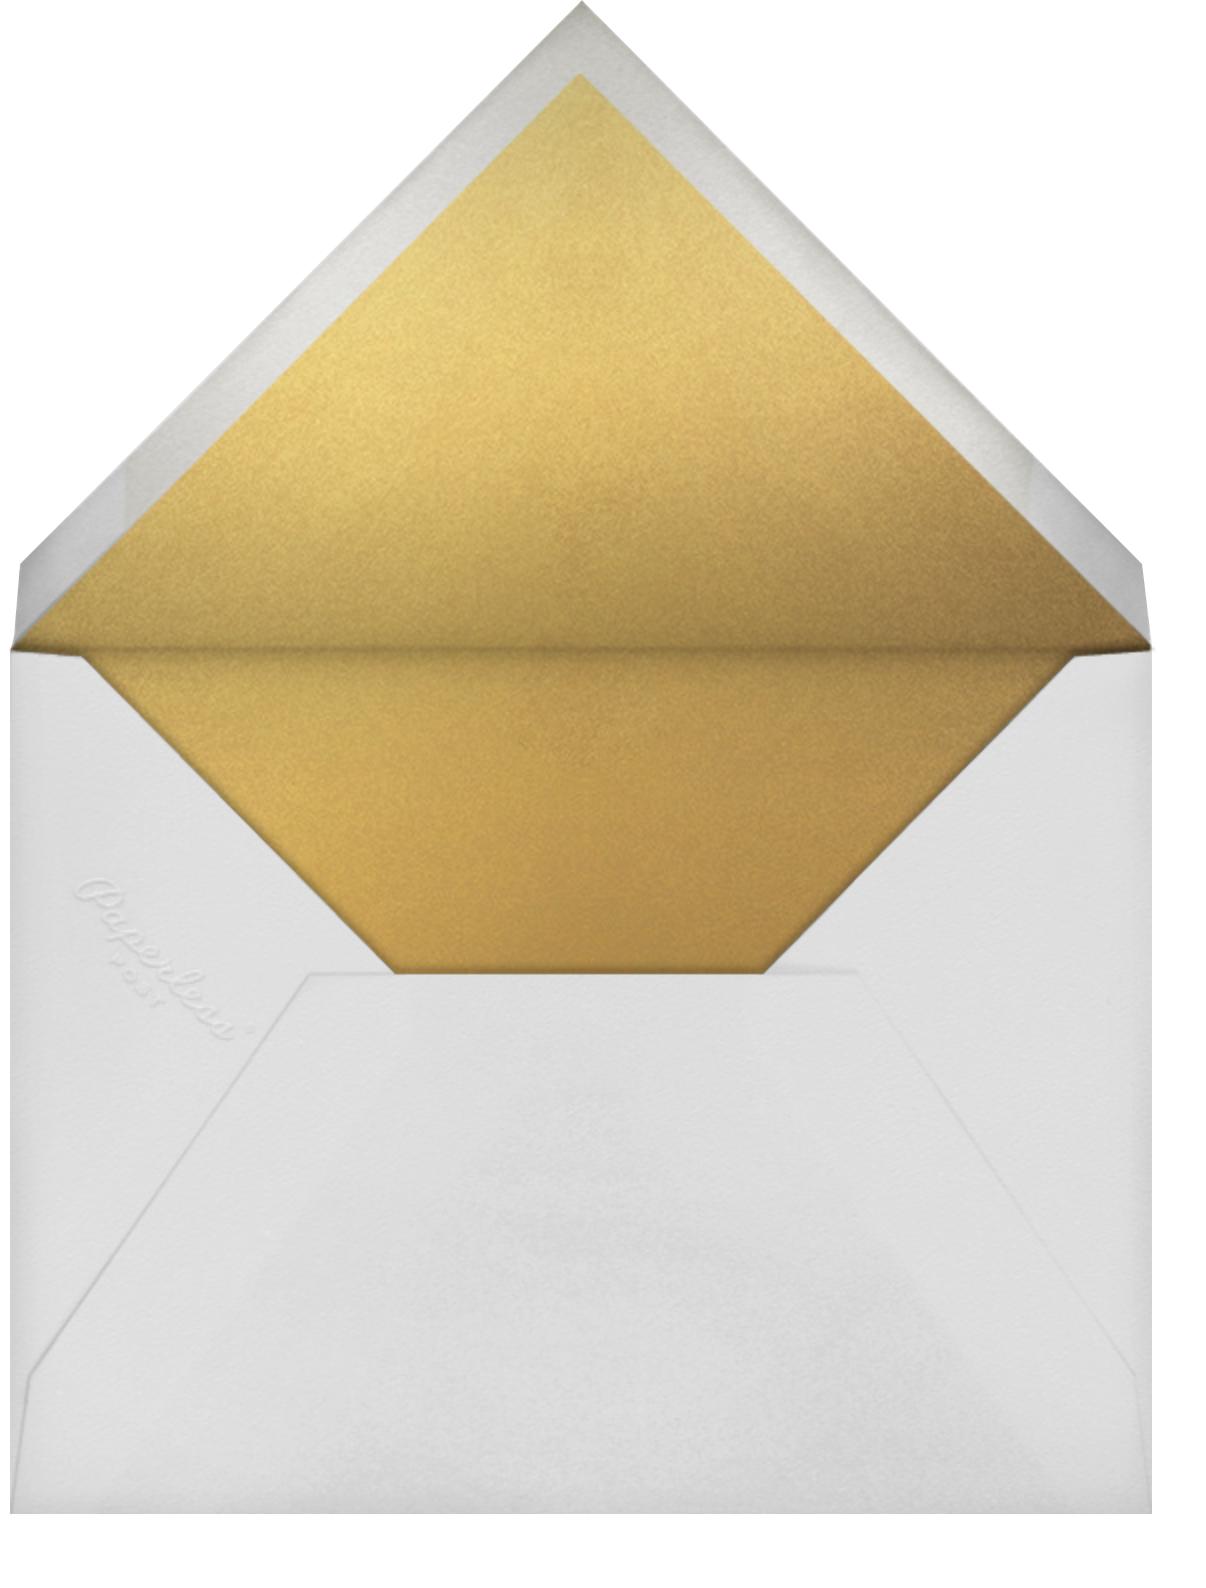 Pressed in Vellum - Paperless Post - Bridal shower - envelope back